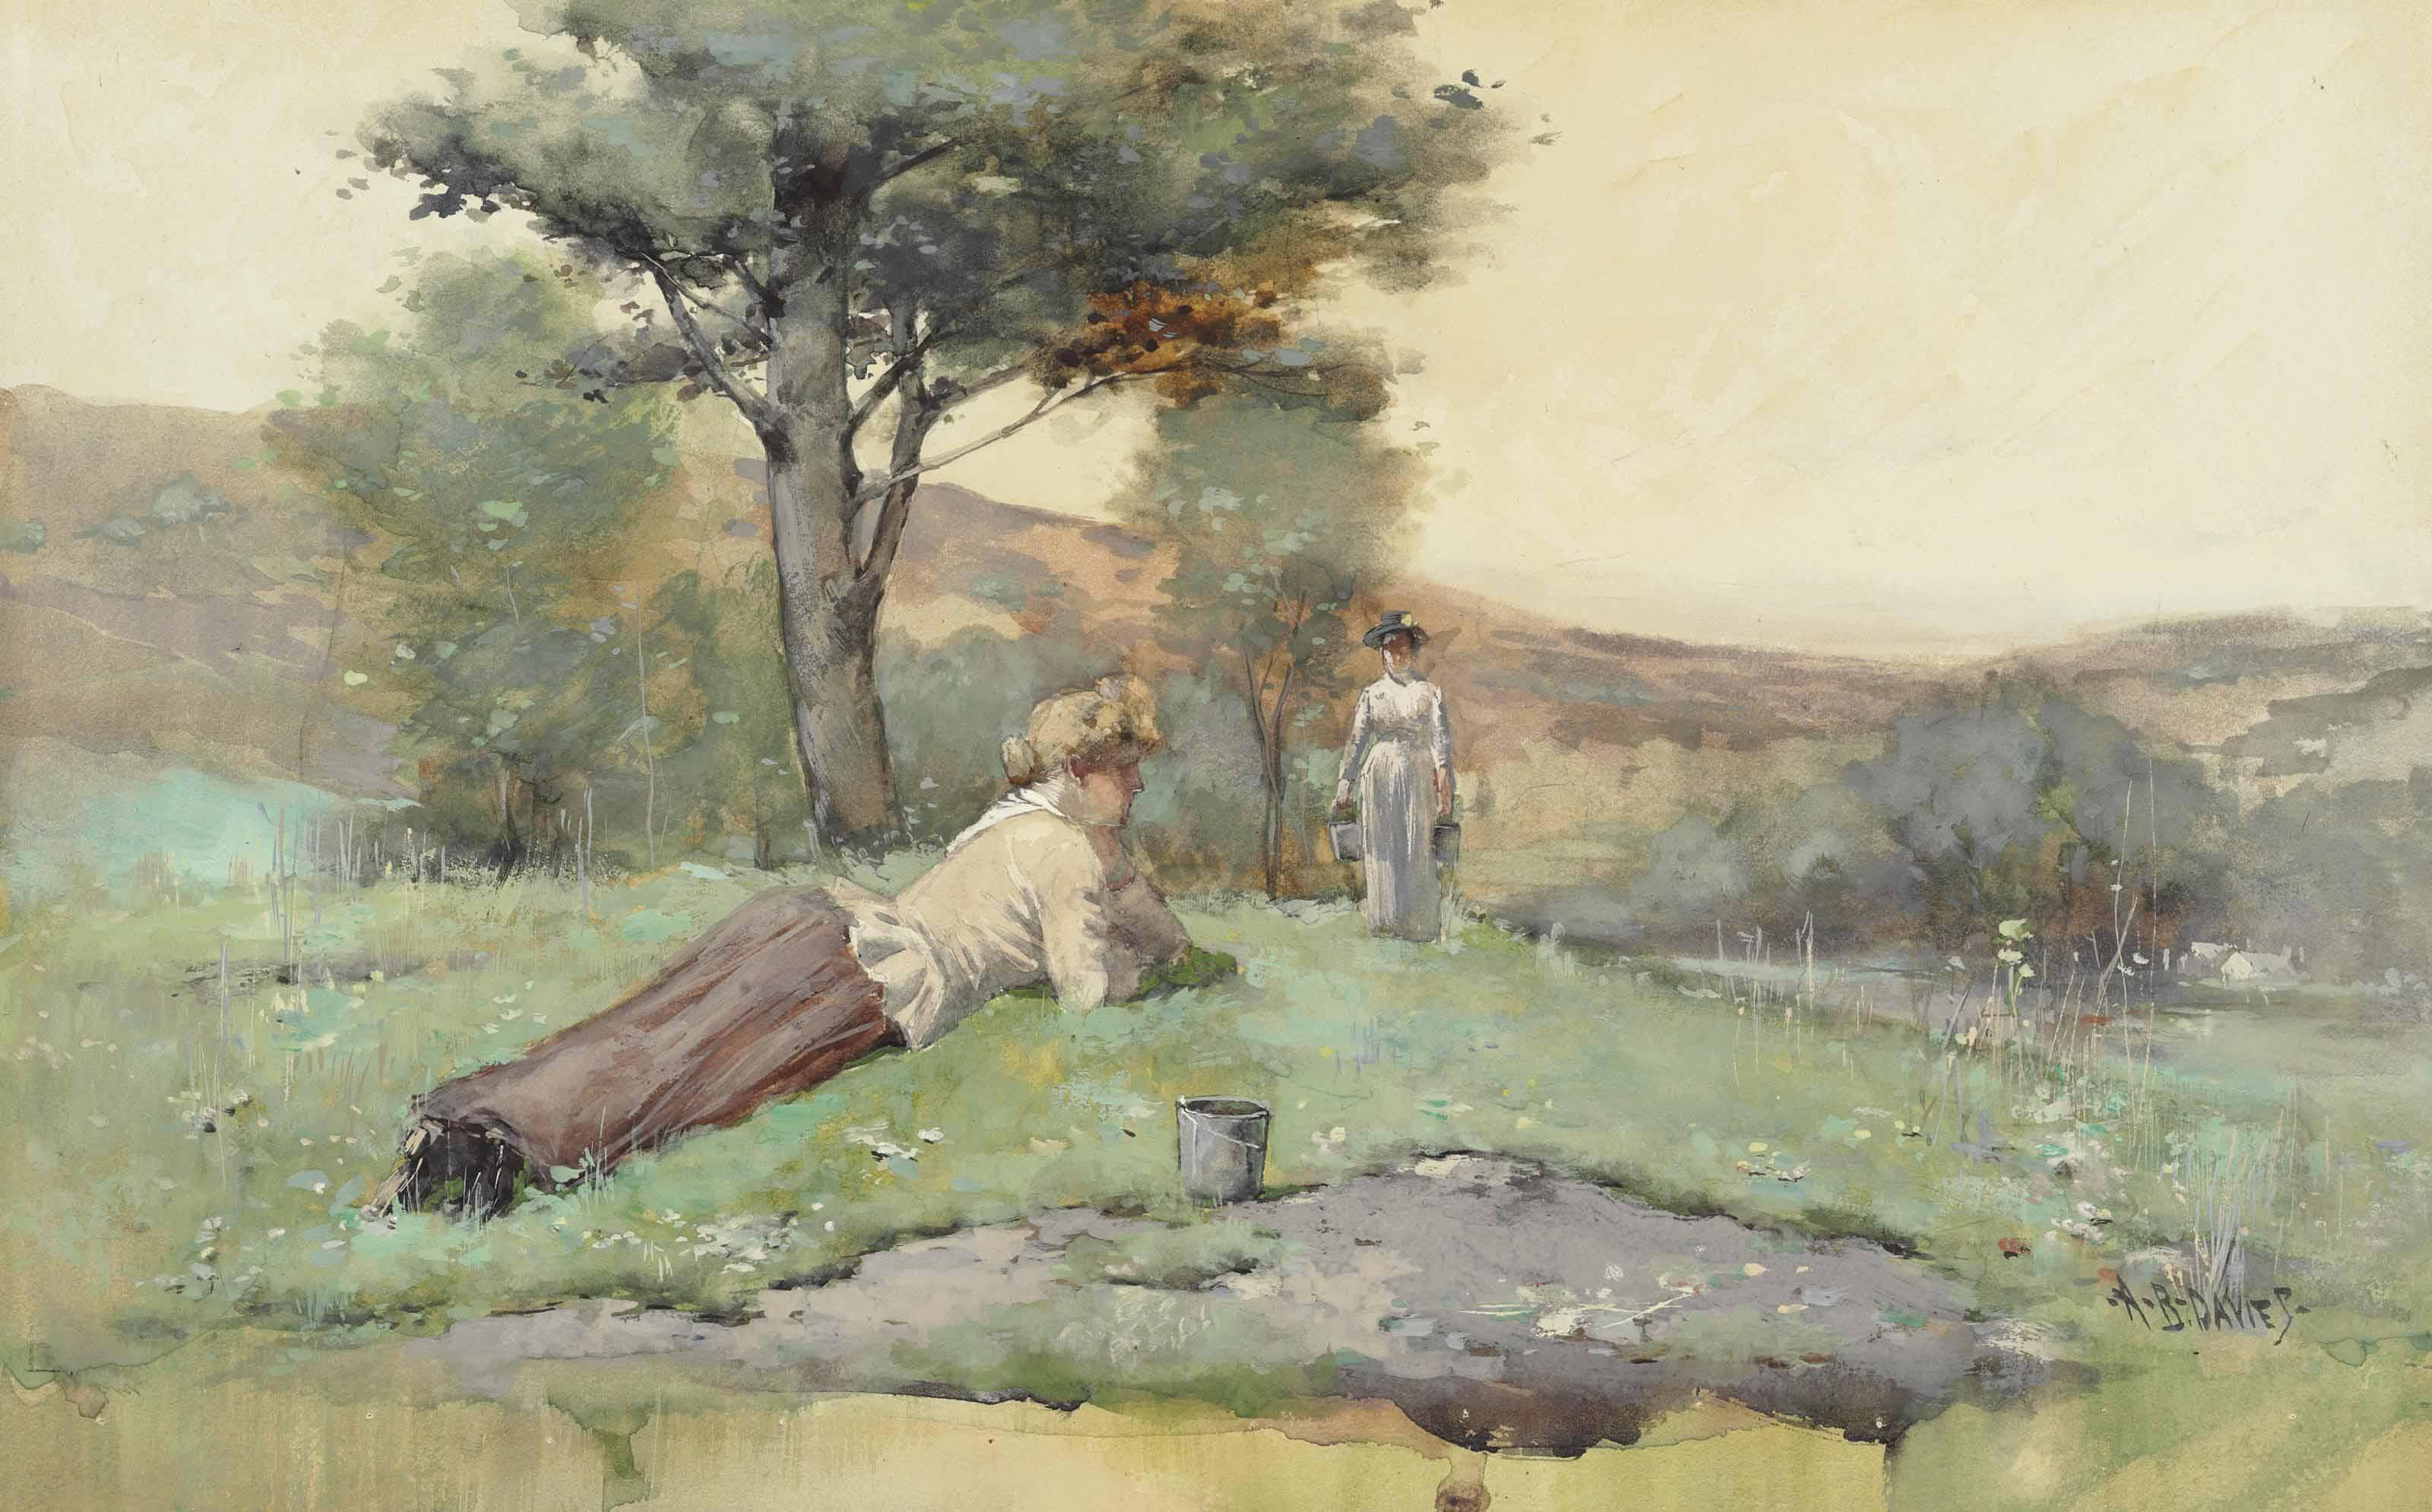 Figures in a Mohawk Landscape